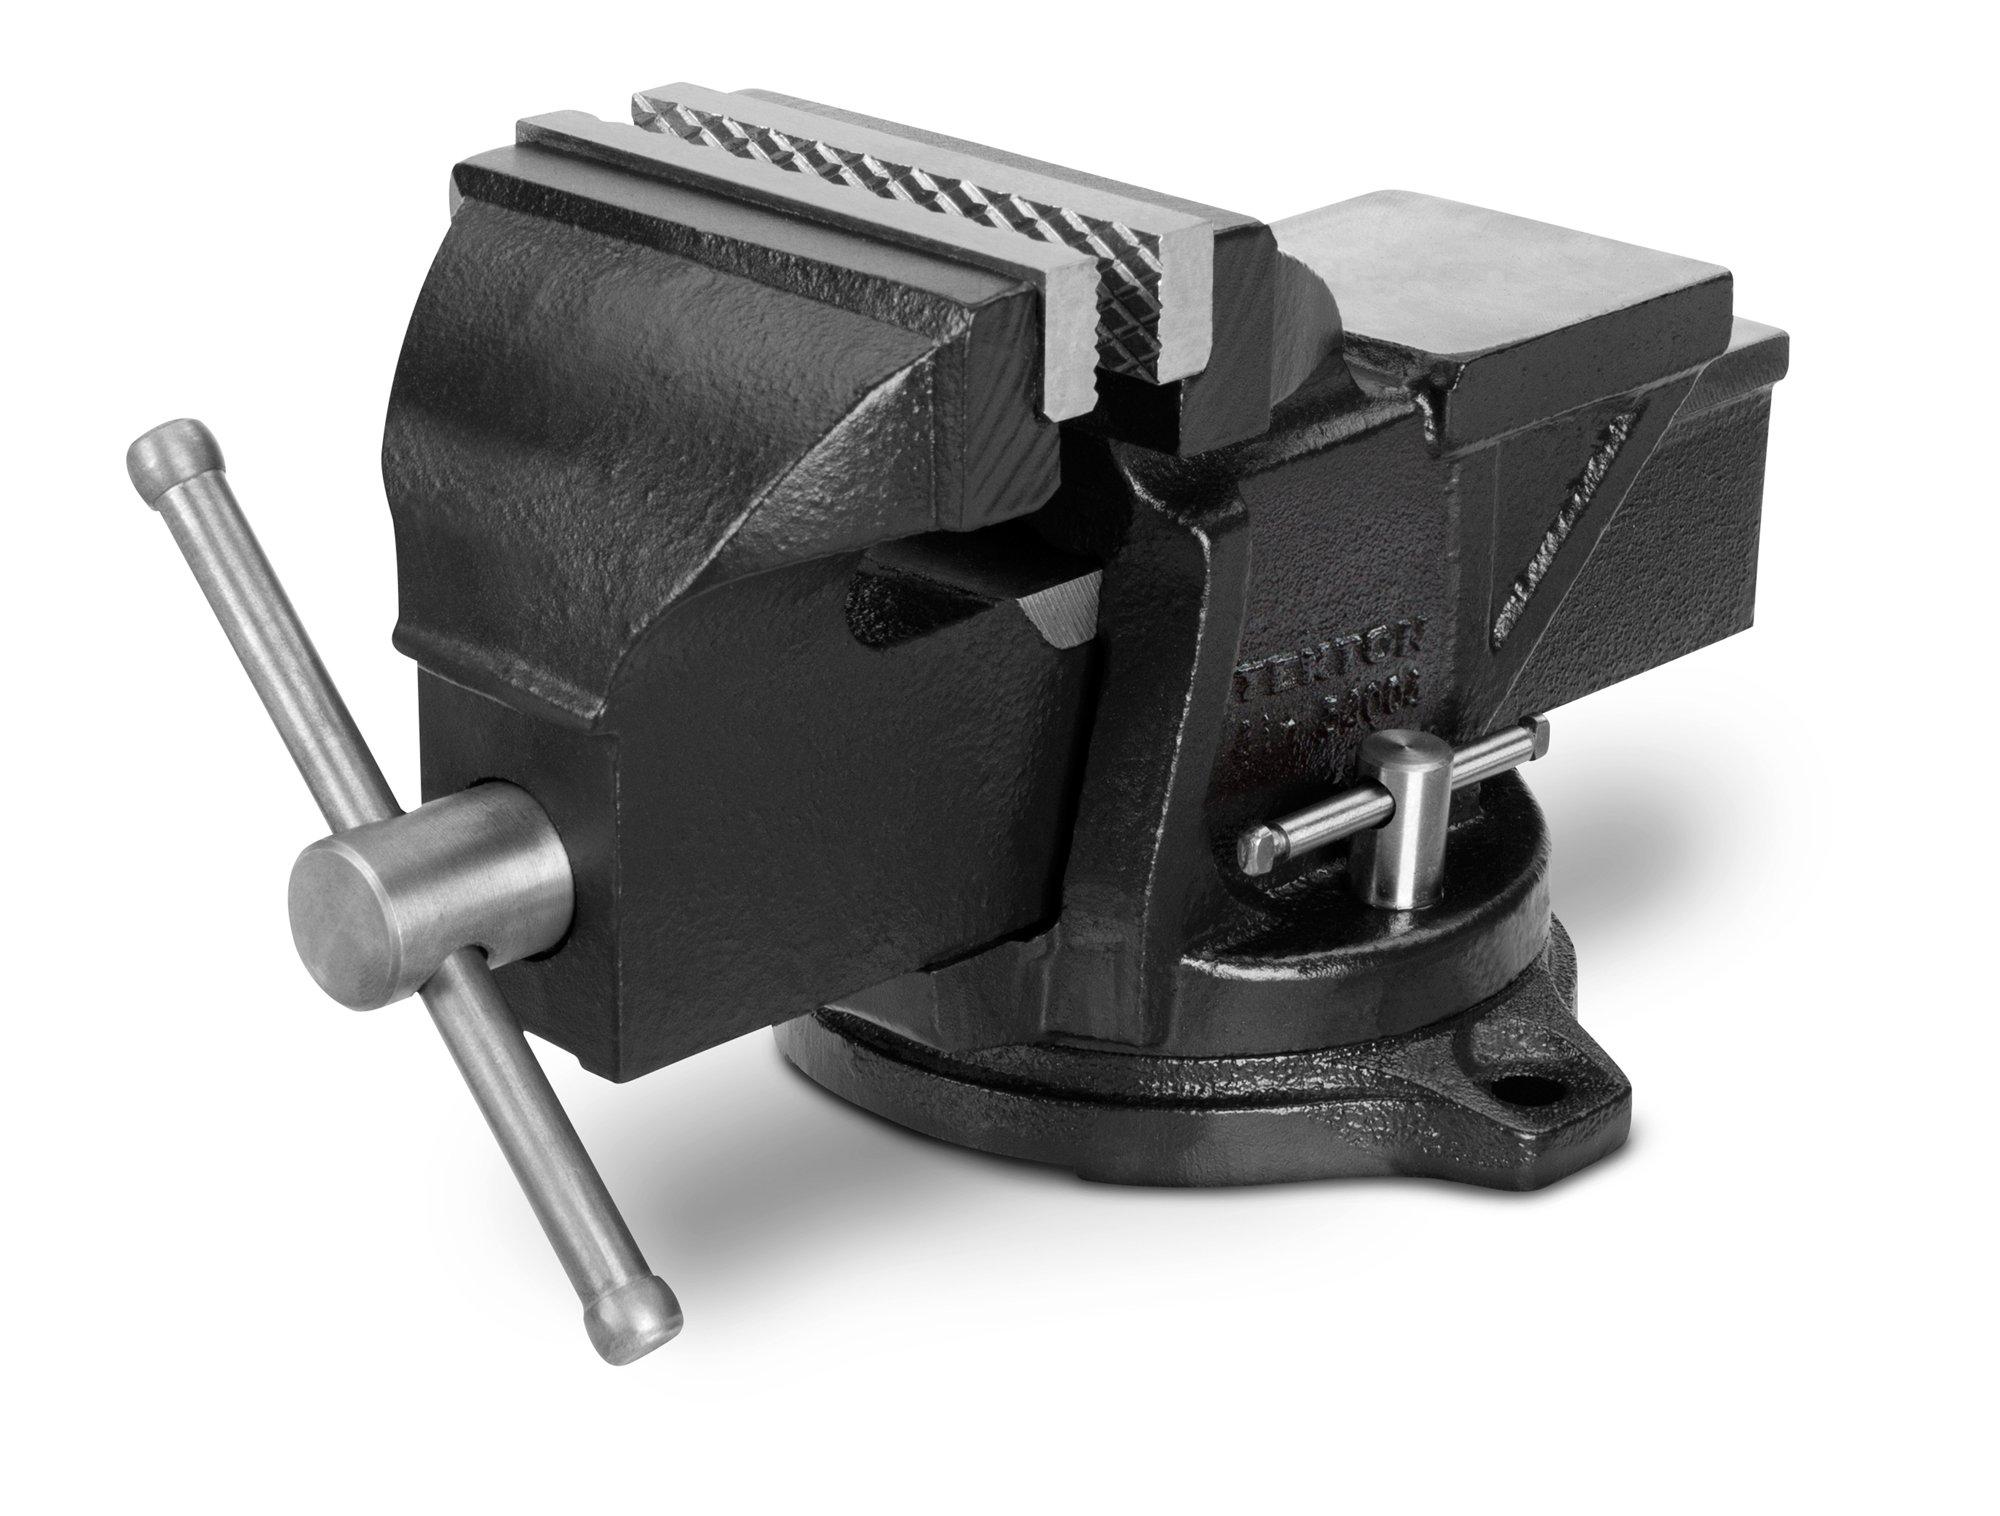 TEKTON 4-Inch Swivel Bench Vise   54004 by TEKTON